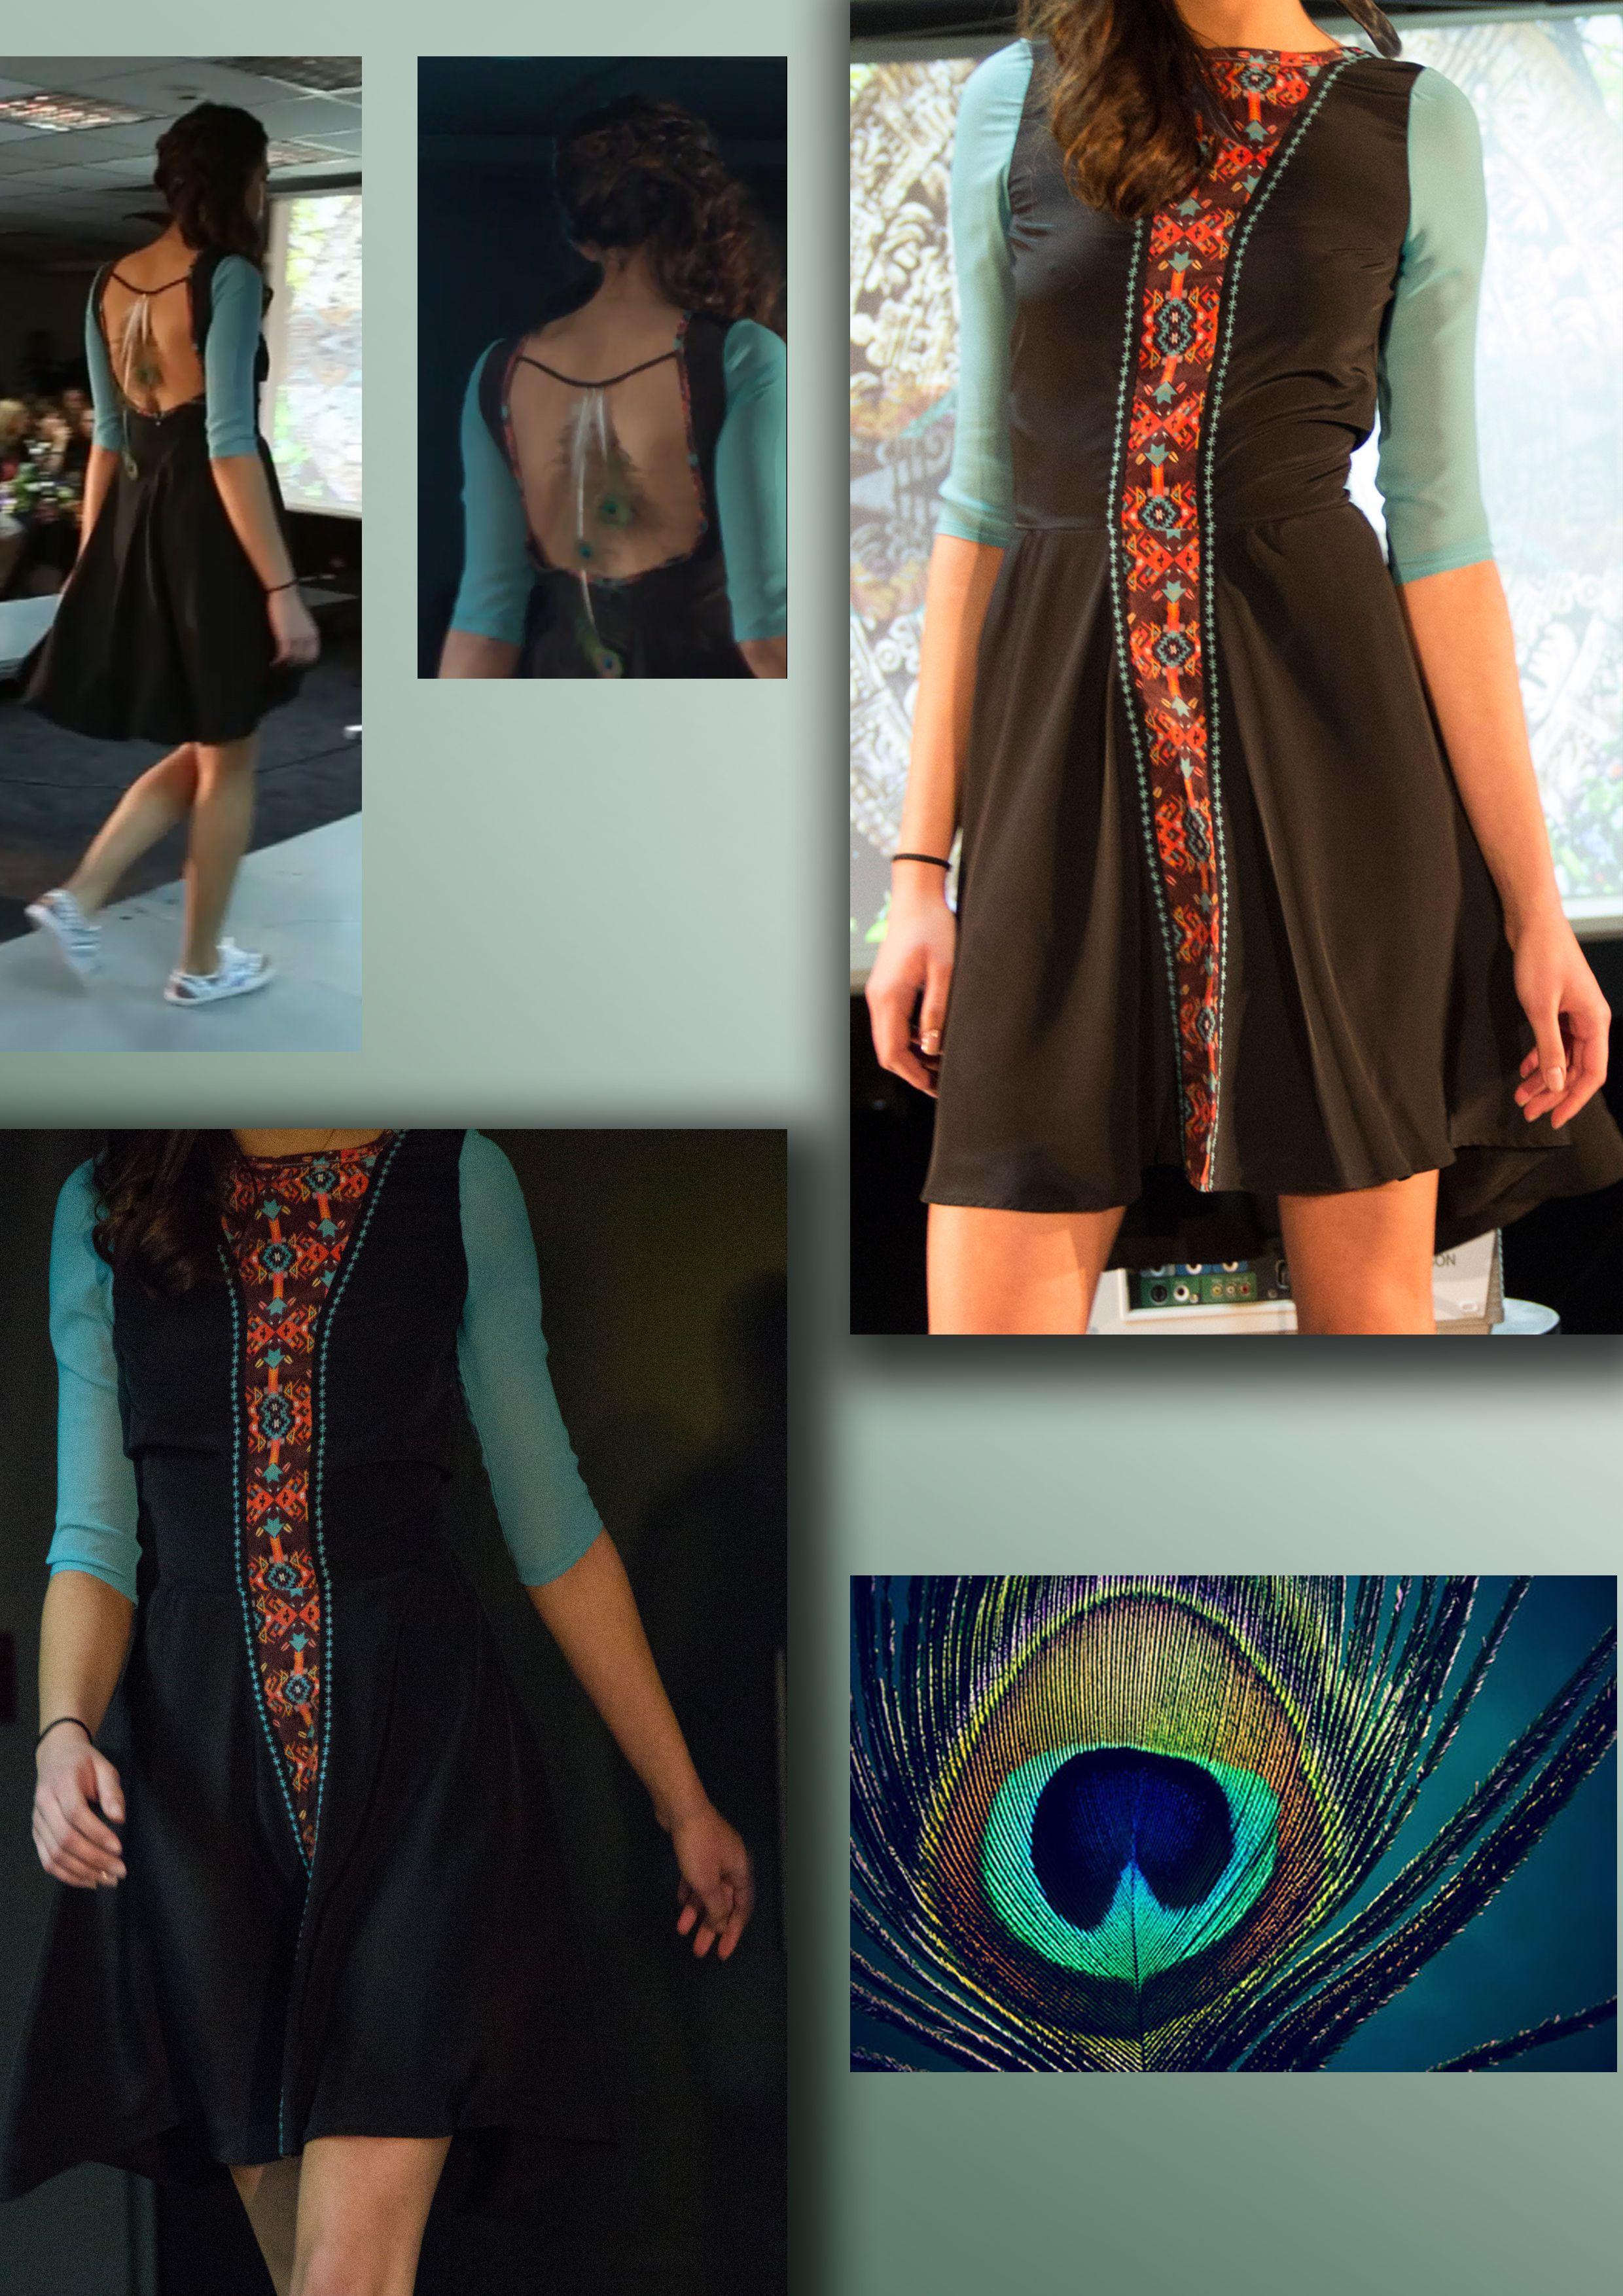 #AZTEC by: Viktoria Neikova, shoes by: DA sneakers - Anna Dimcheva #womenfashion #summerstyle #longskirt #aztecprint #chifon #blouse #peacockfeathers  https://www.facebook.com/pages/DA-sneakers/690262114339610?fref=ts